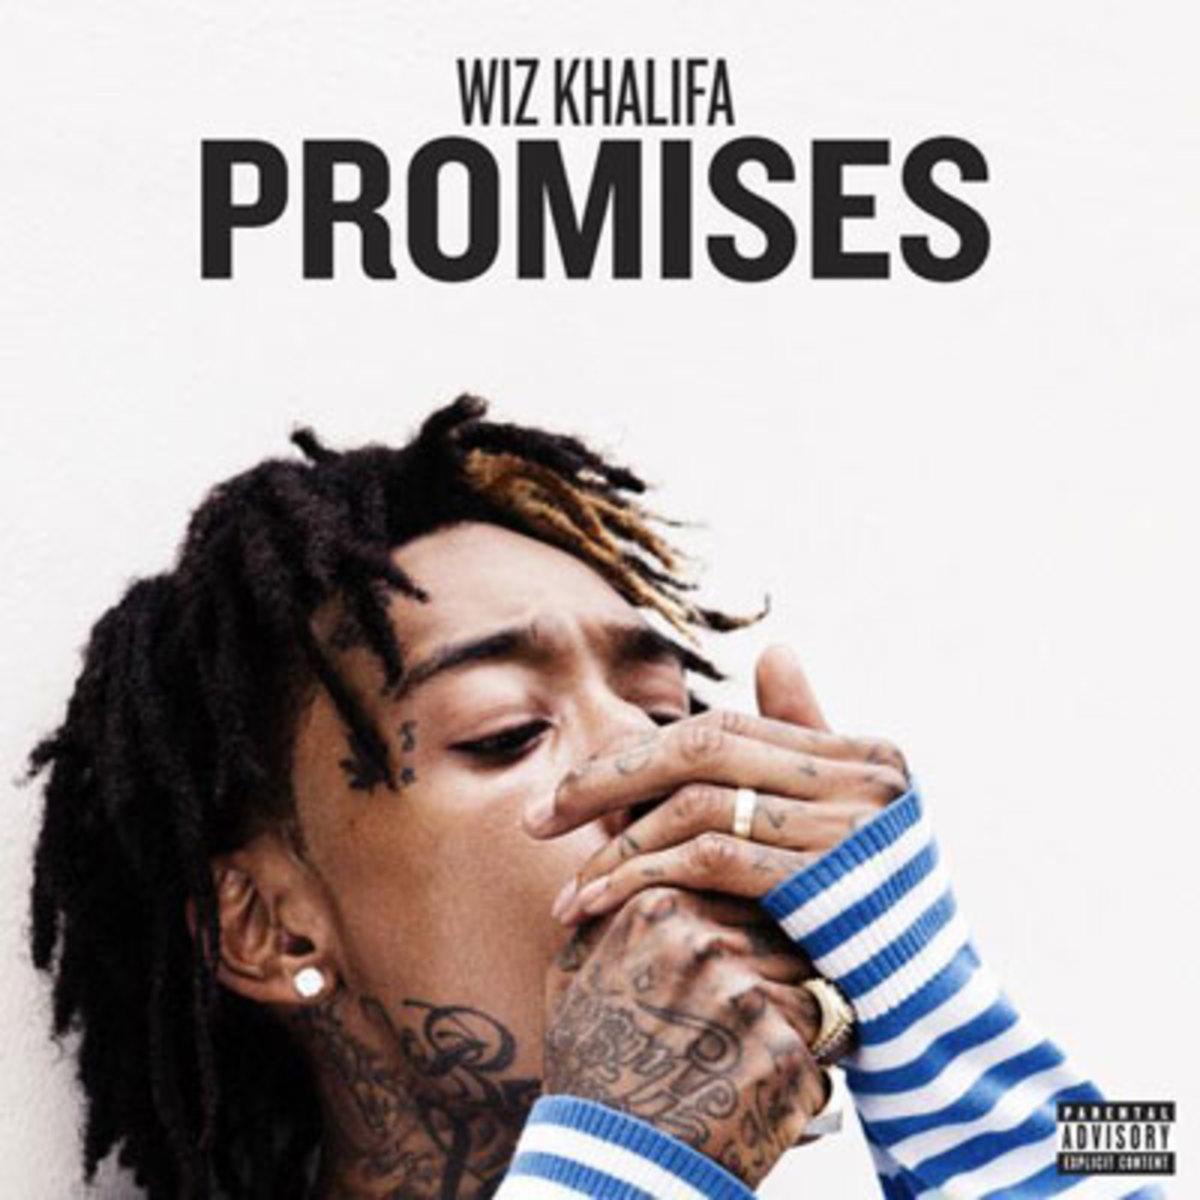 wizkhalifa-promises.jpg